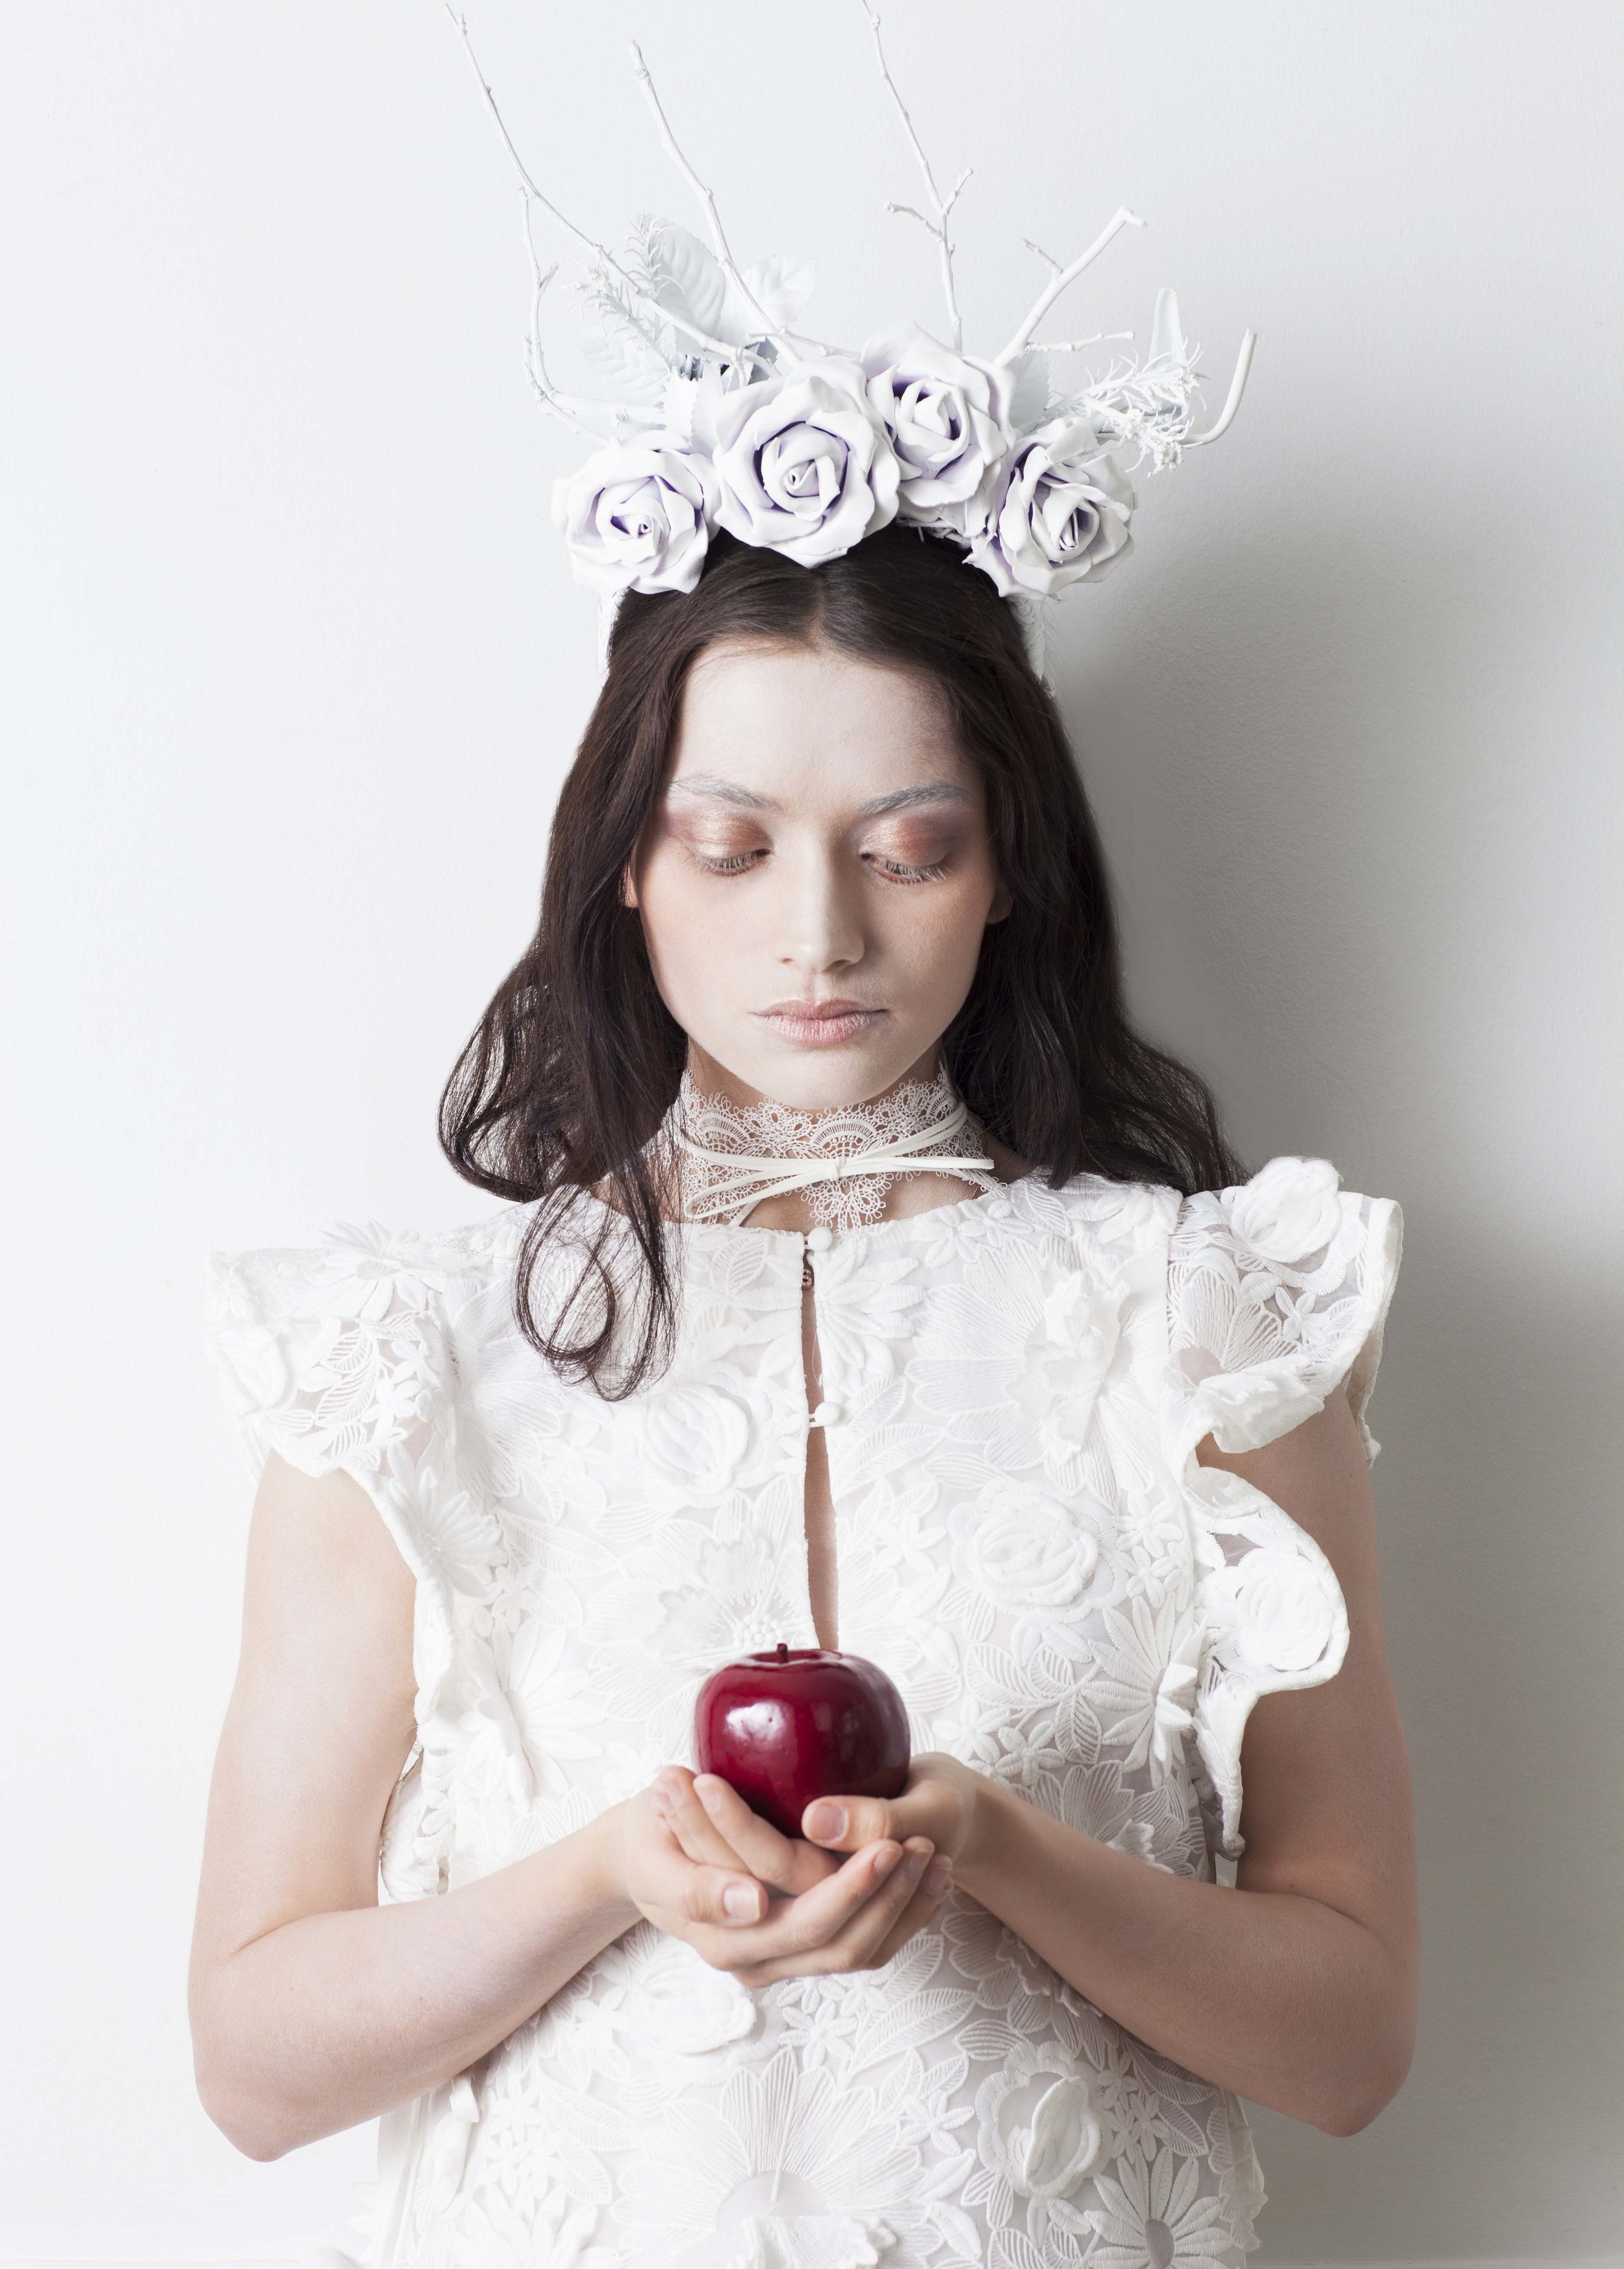 snow white1_PORTRait.jpg